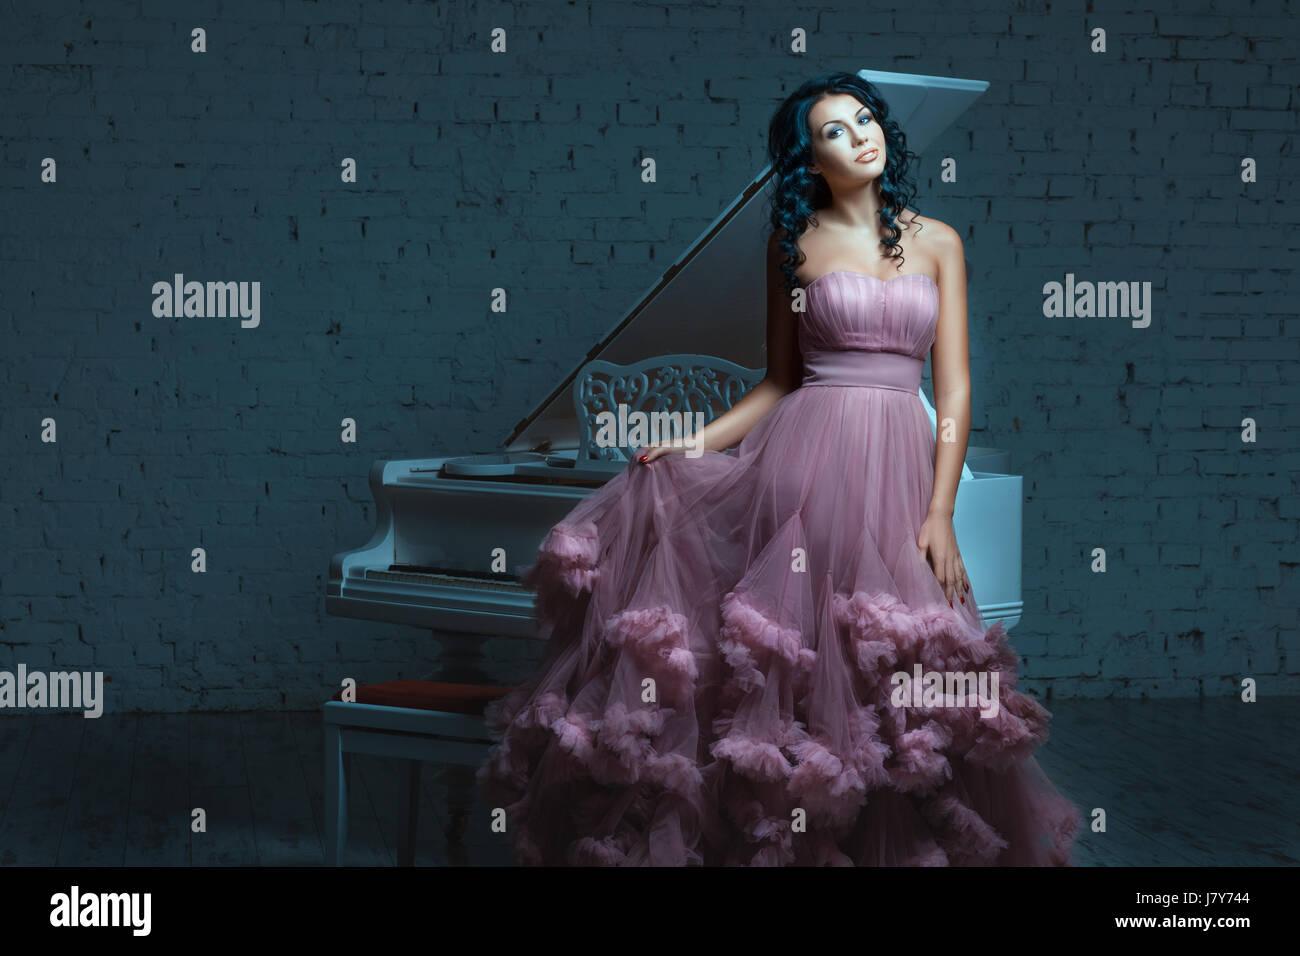 Beautiful woman posing next to a white piano. Her lush pink dress. - Stock Image